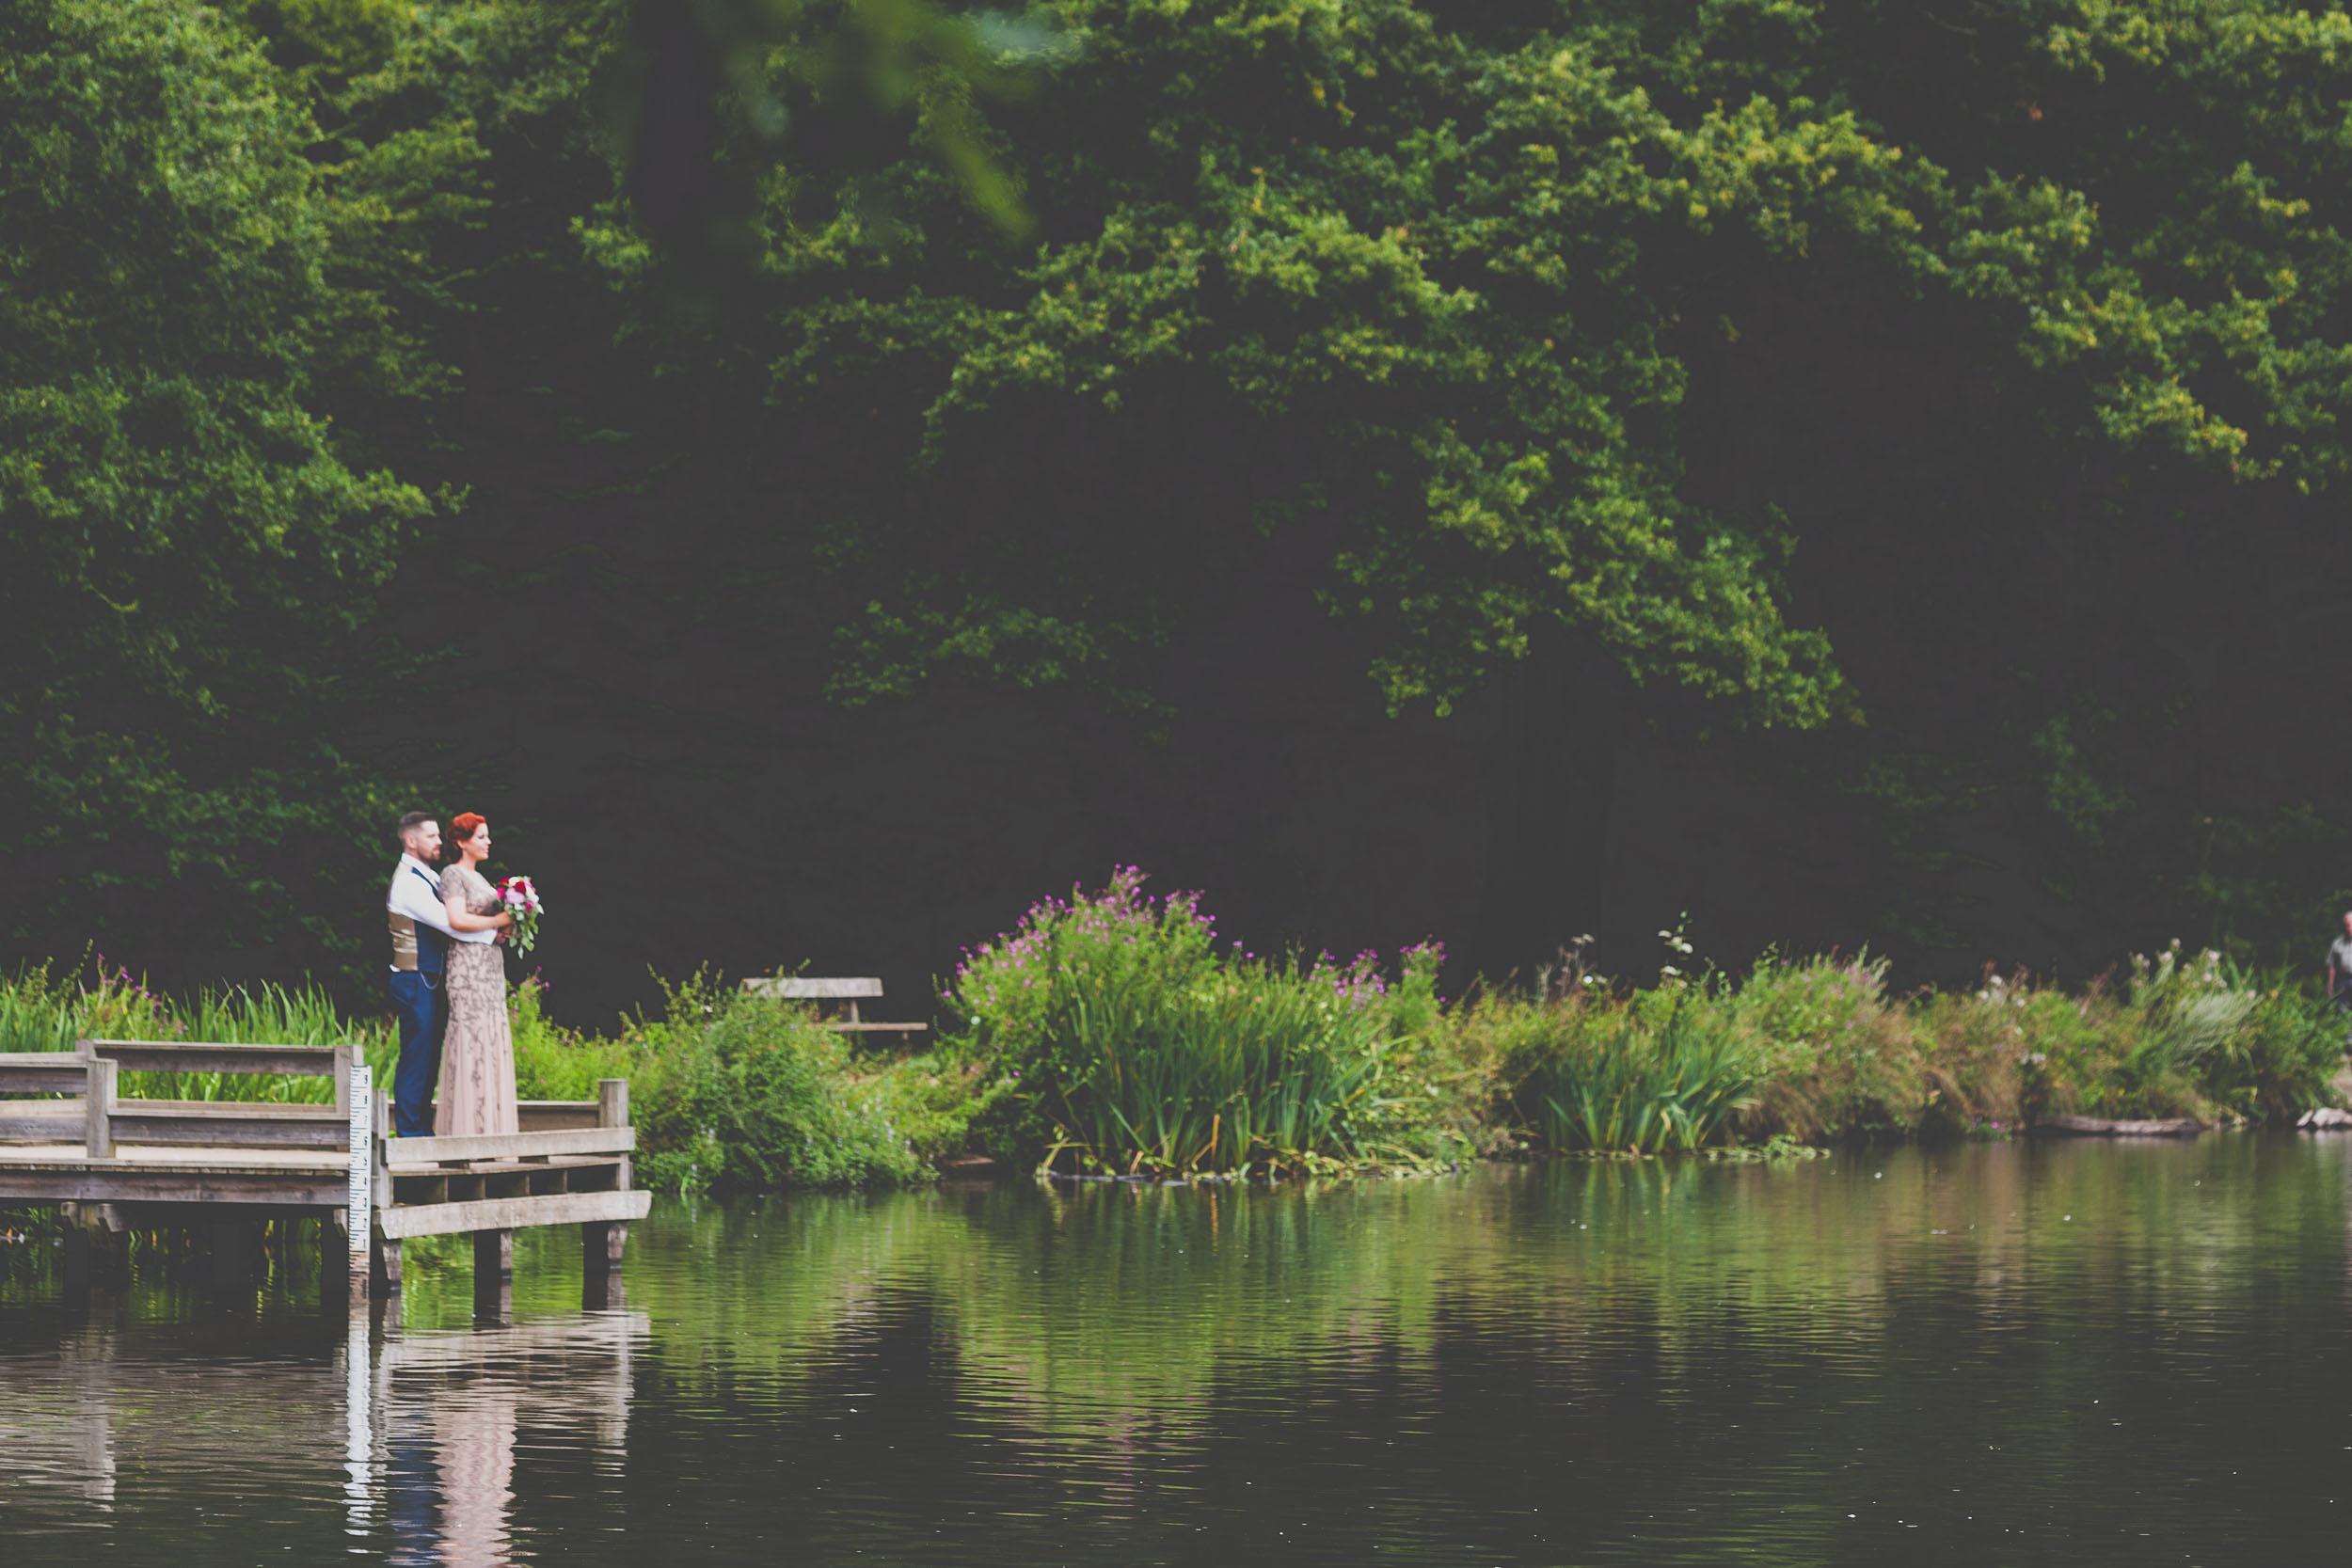 queen-elizabeths-hunting-lodge-epping-forest-wedding267.jpg